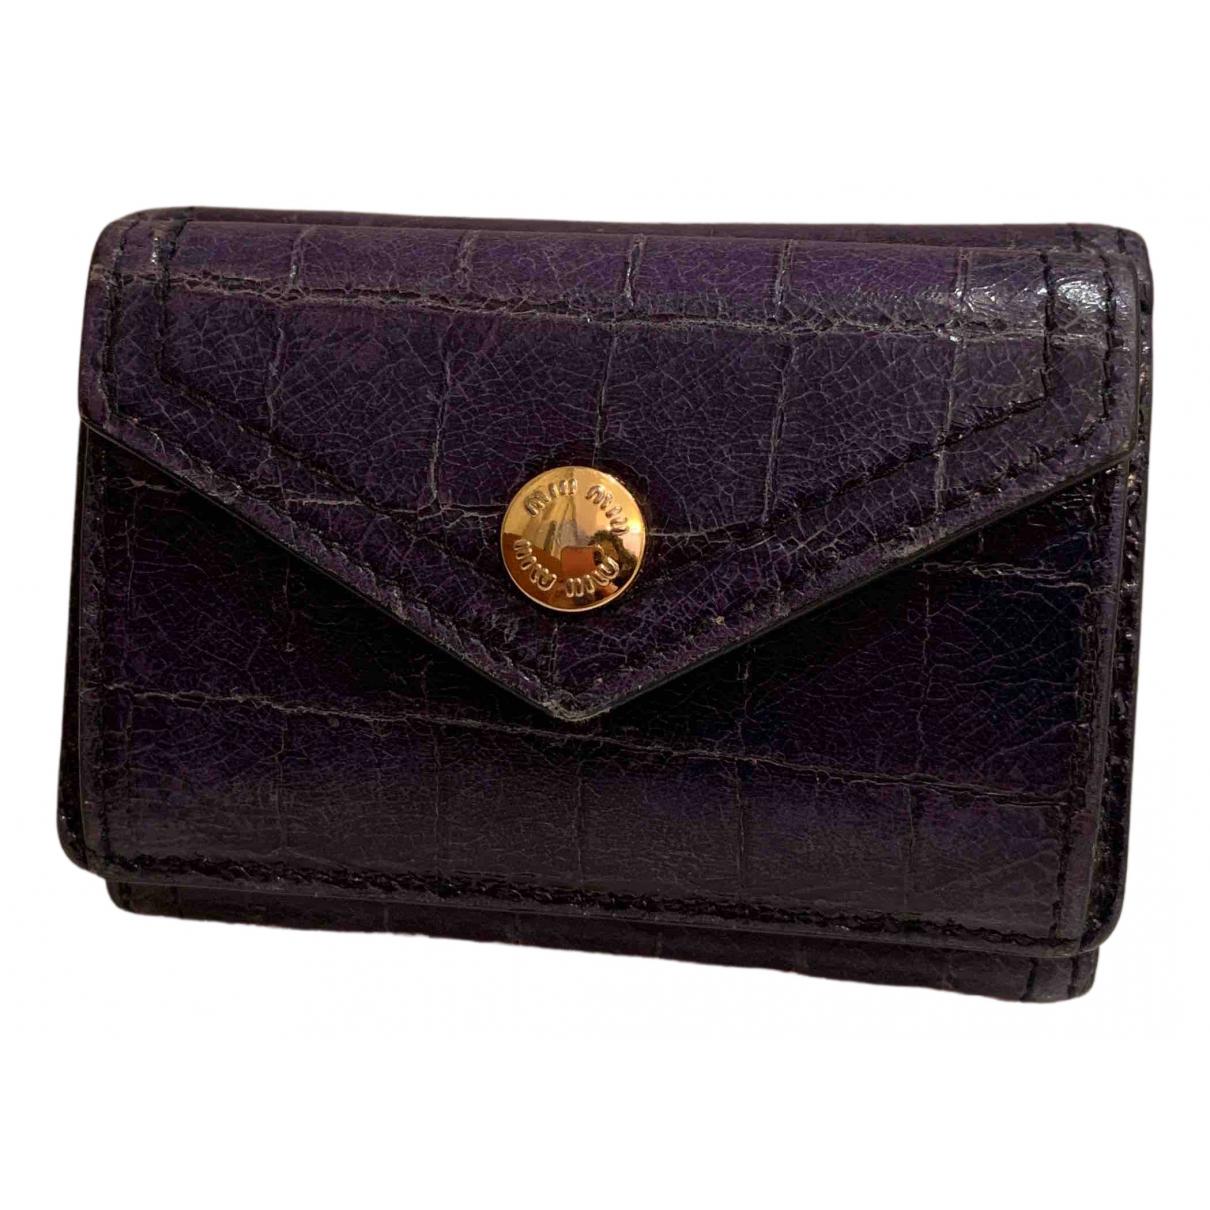 Miu Miu N Navy Leather Purses, wallet & cases for Women N